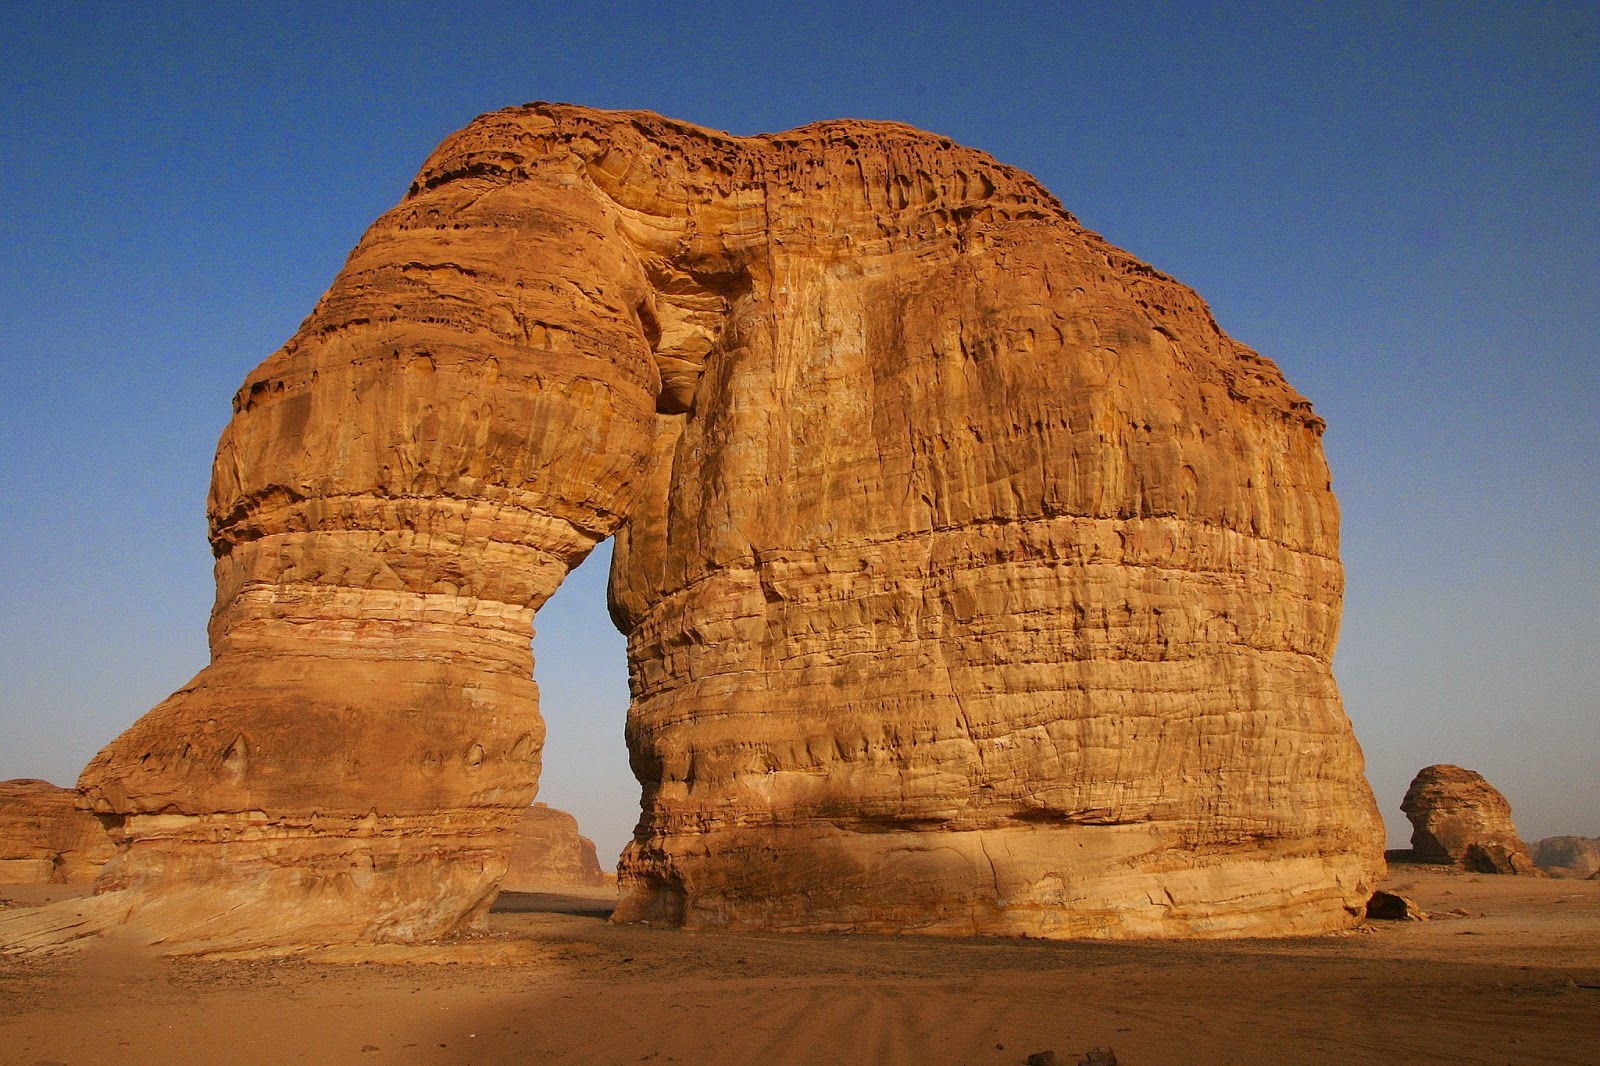 Al Ula Saudi Arabia  City pictures : Tour Operators in Riyadh, Saudi Arabia ~ Life in Saudi Arabia